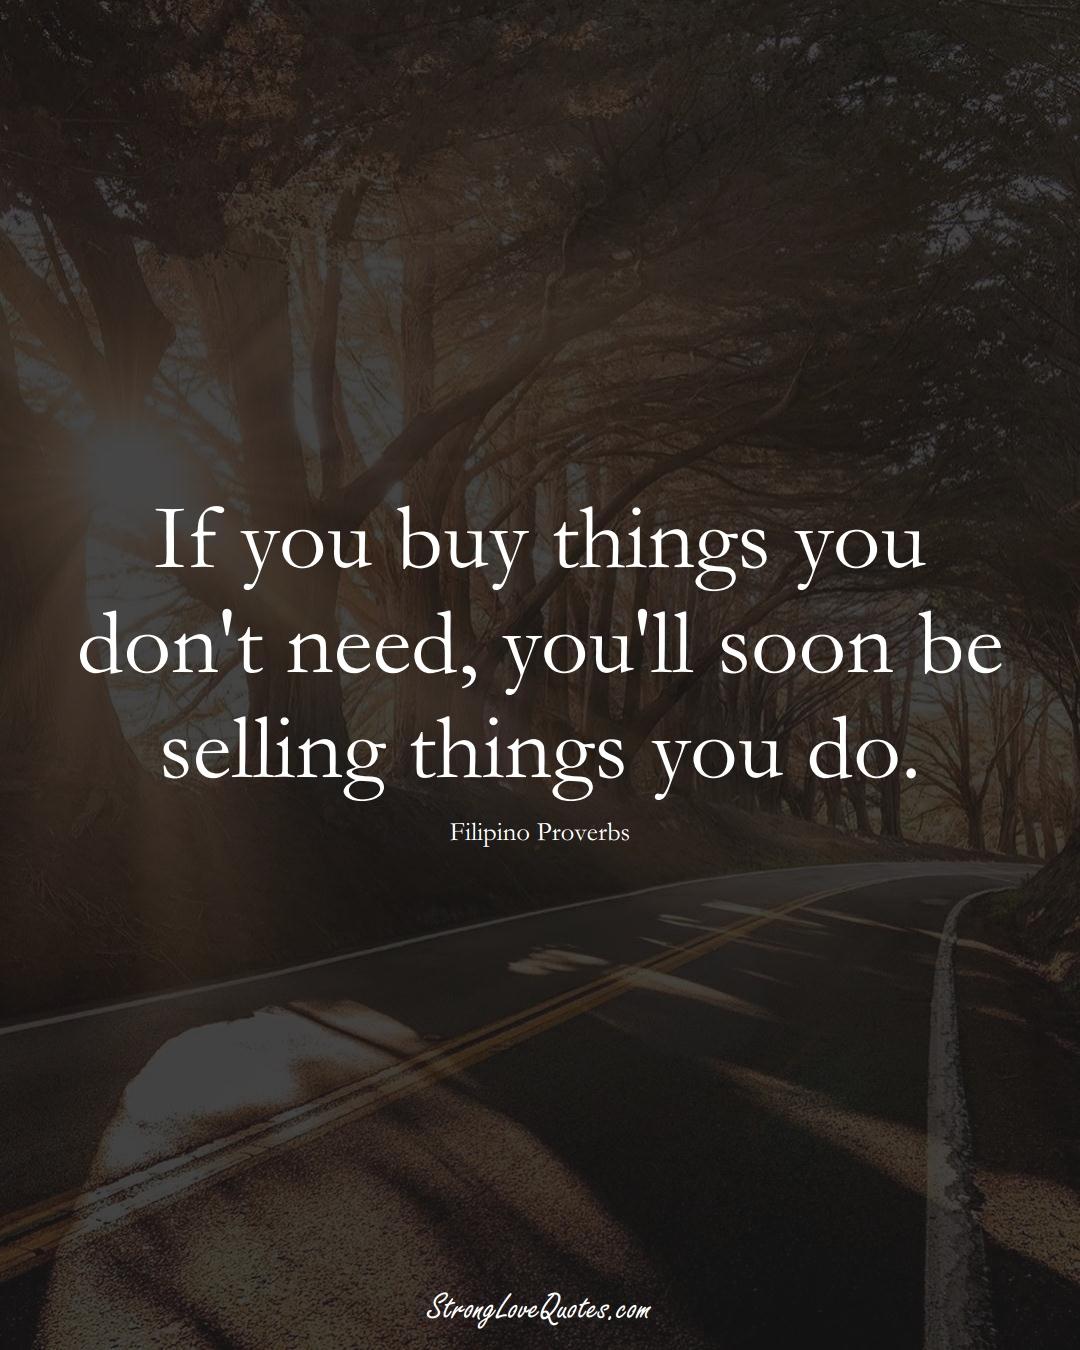 If you buy things you don't need, you'll soon be selling things you do. (Filipino Sayings);  #AsianSayings